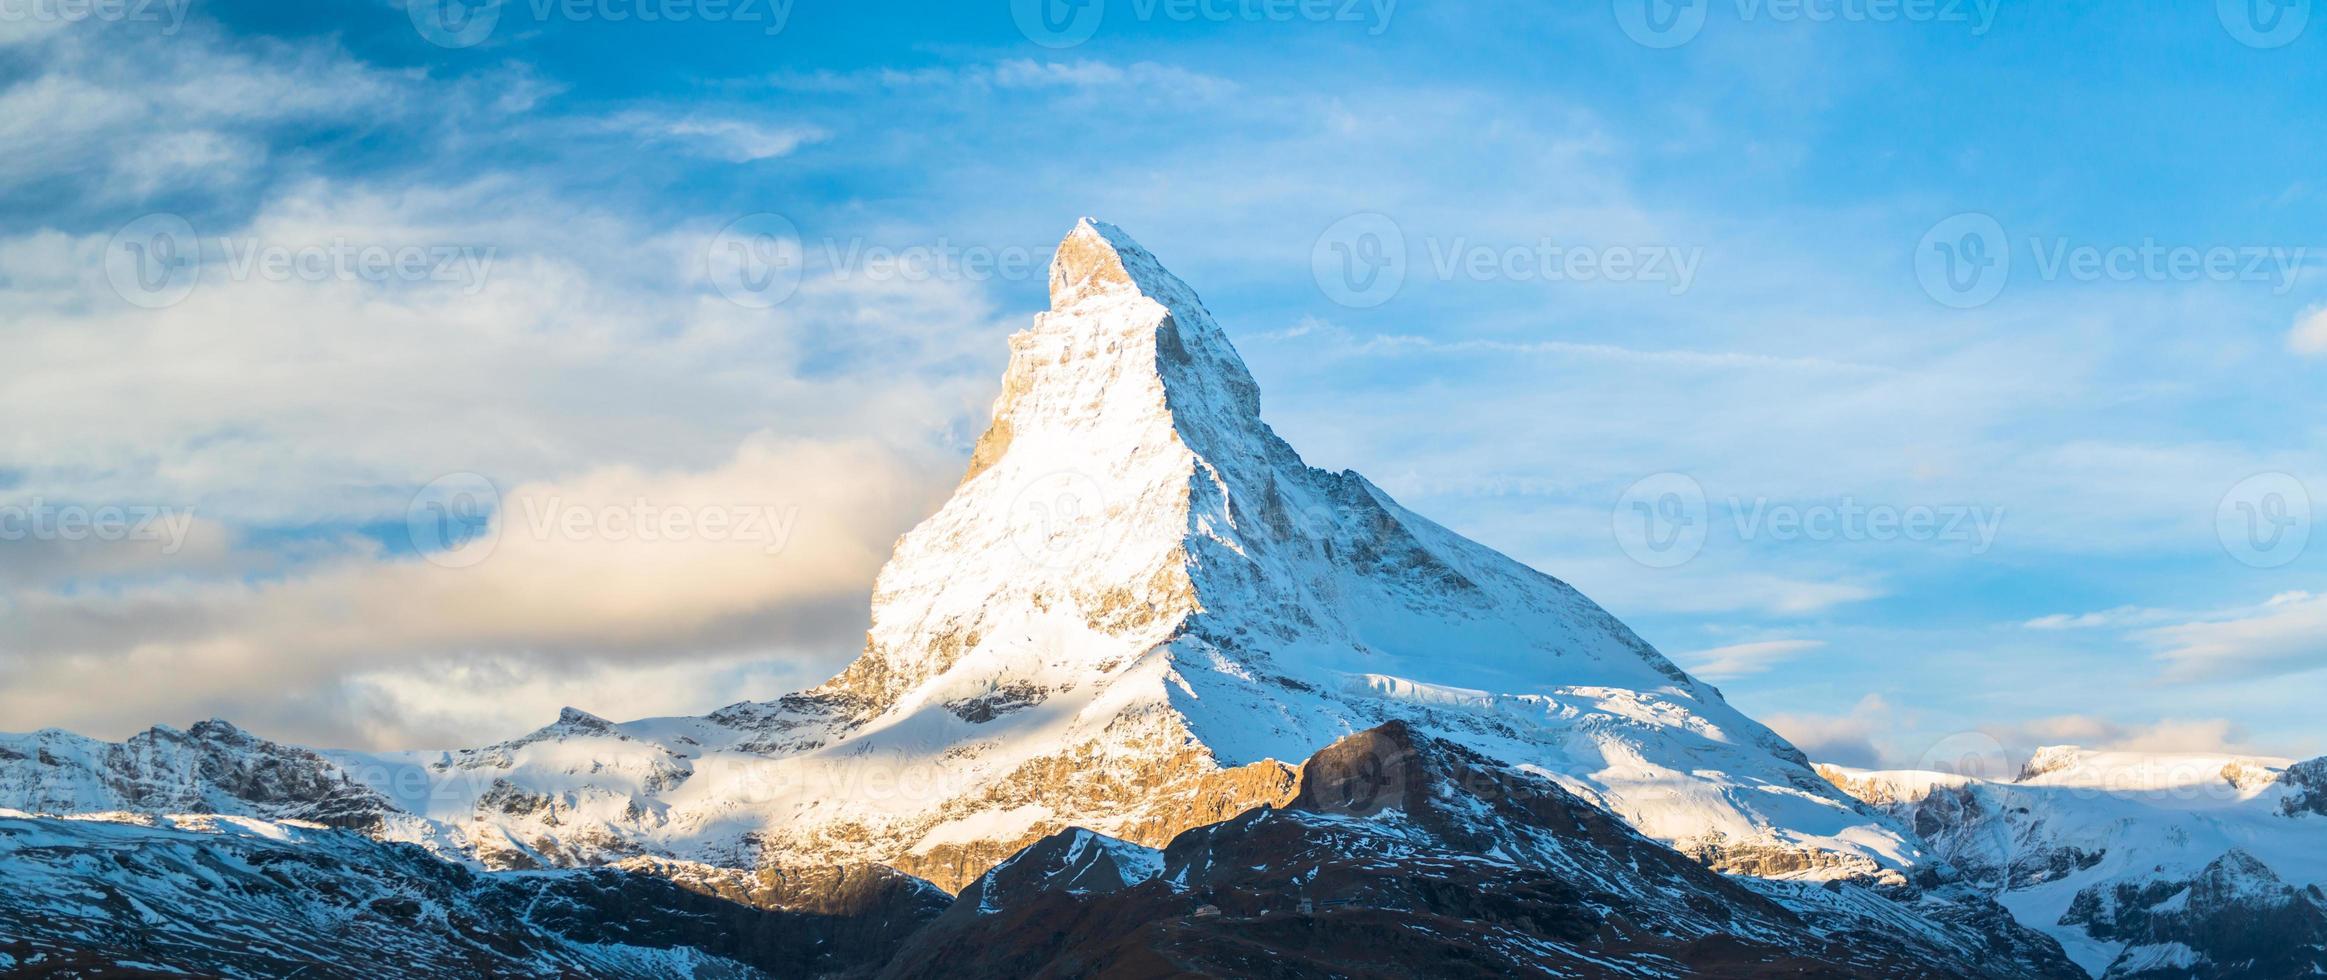 Matterhorn peak, Zermatt, Switzerland photo